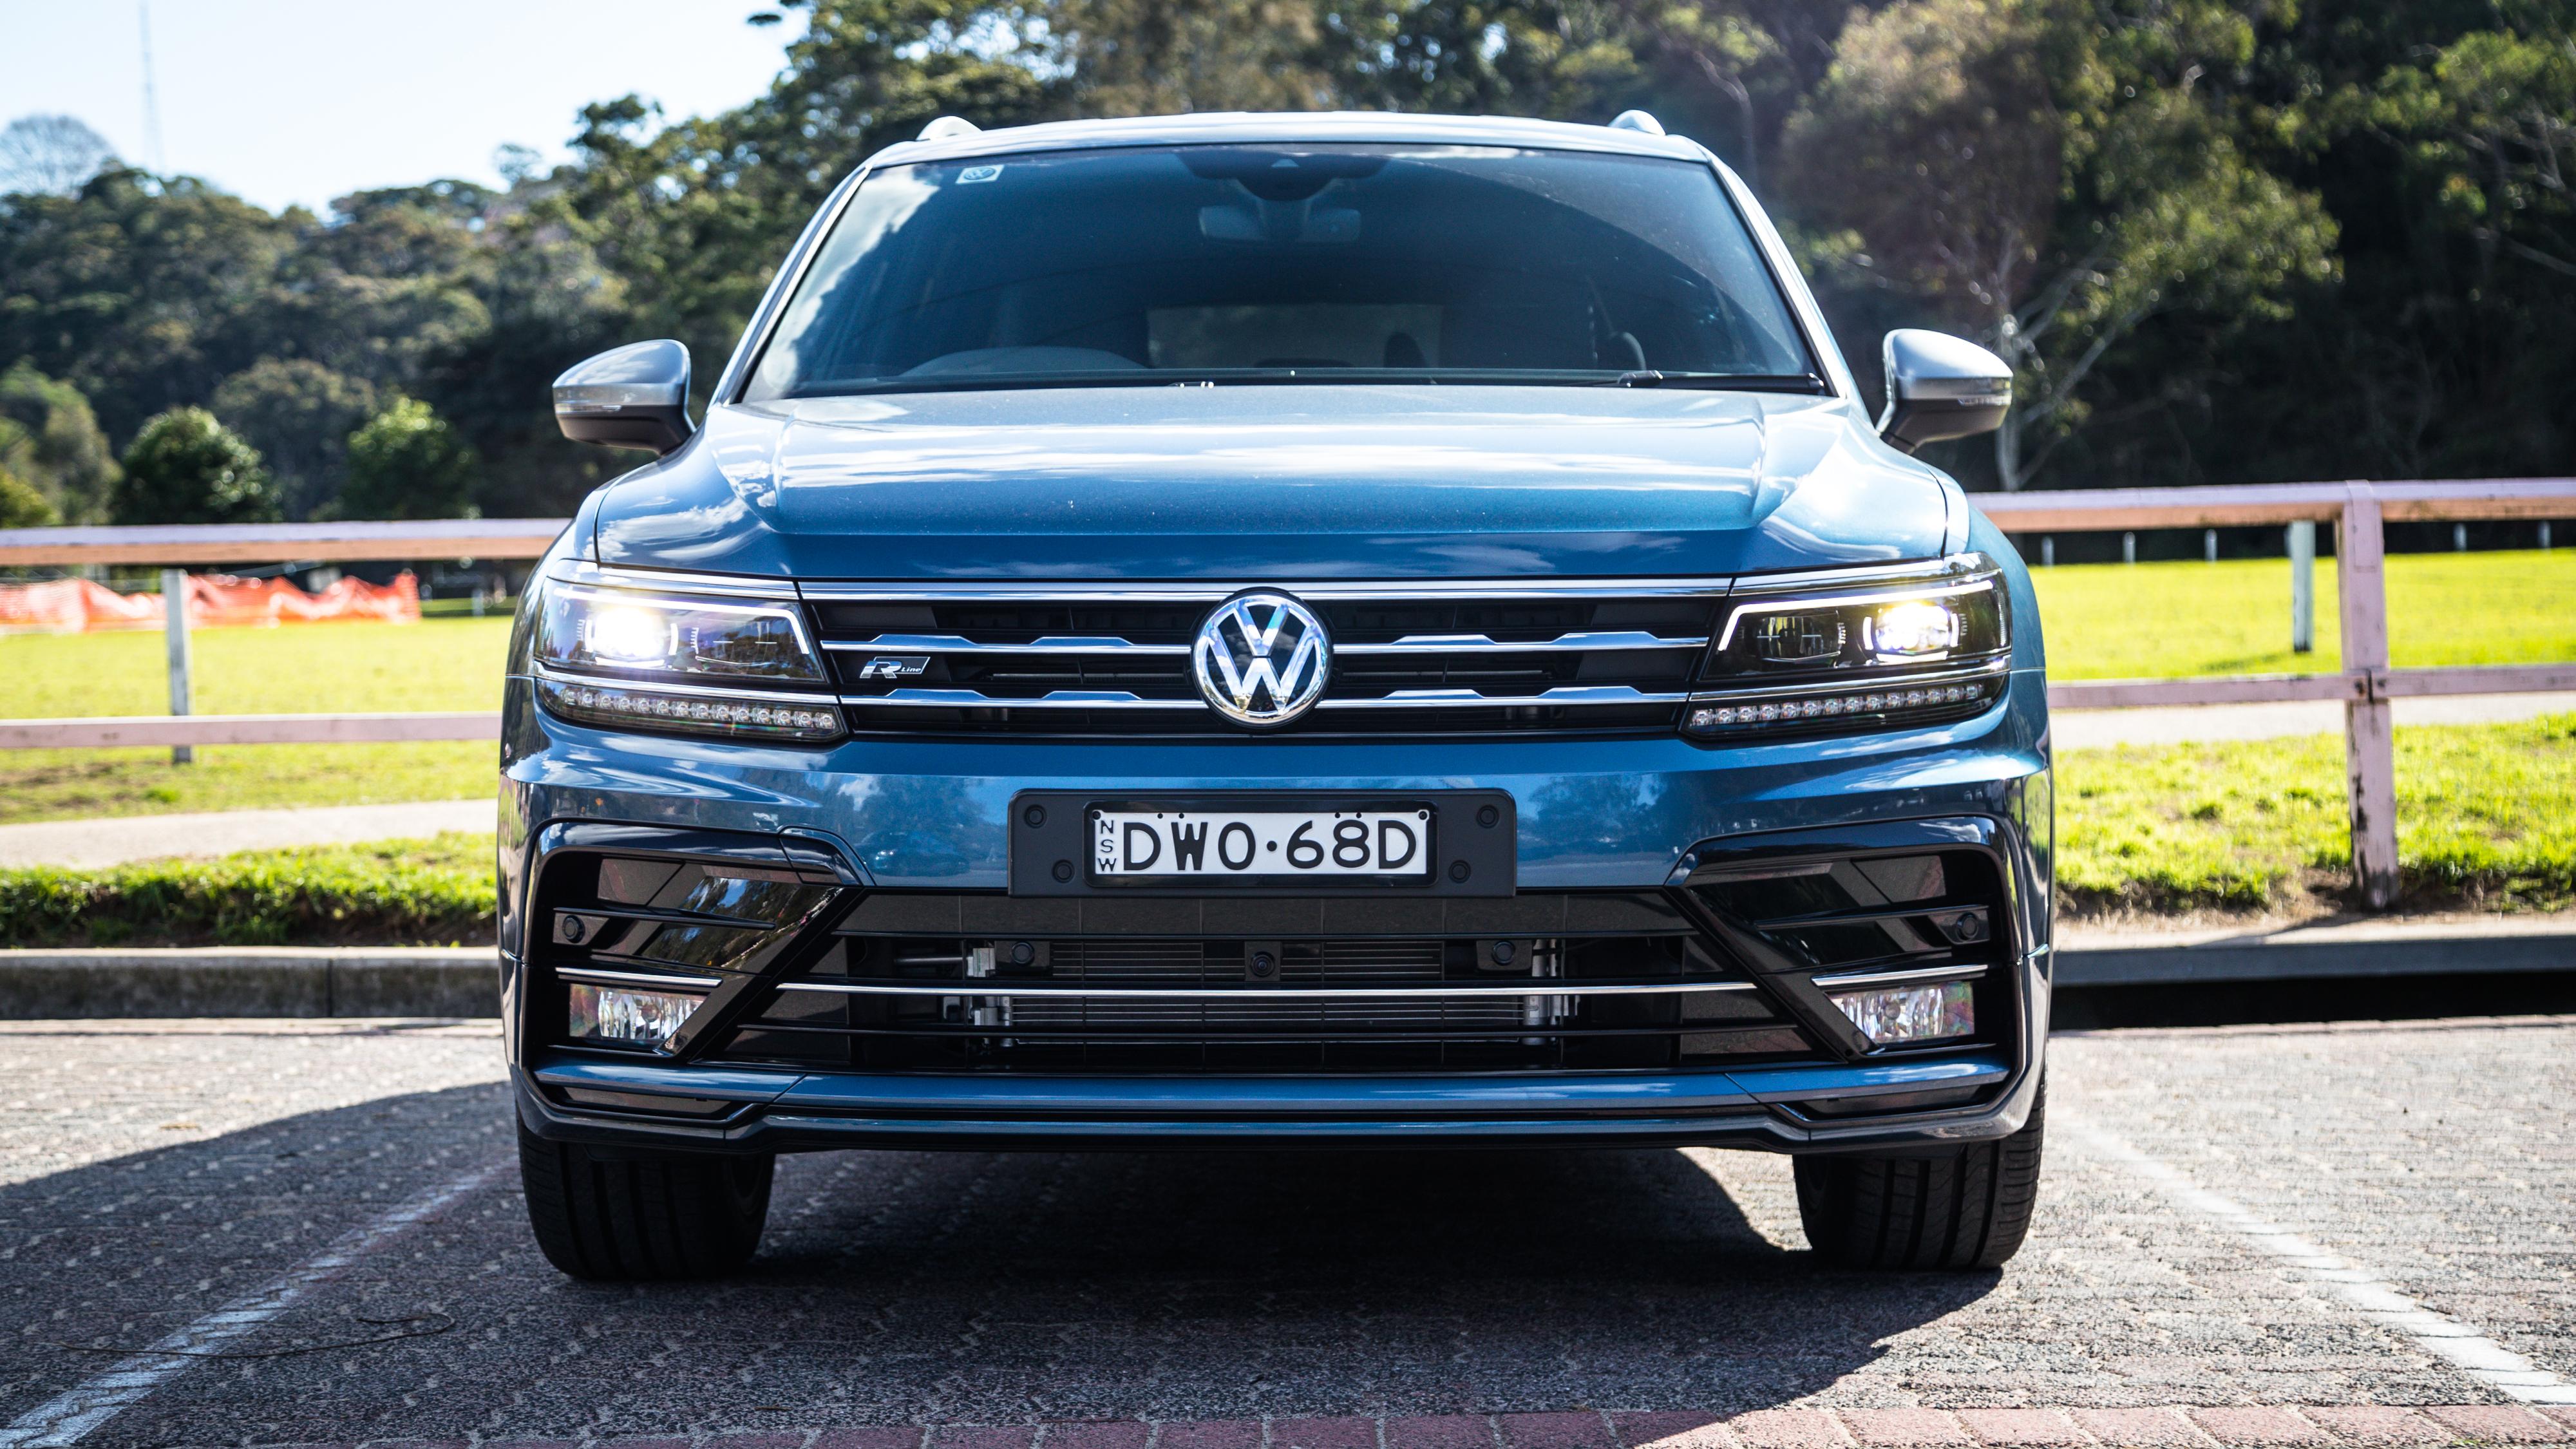 2018 VW Tiguan Allspace: Redesign, Trims, Price >> 2018 Vw Tiguan Allspace Redesign Trims Price 2020 Upcoming Car